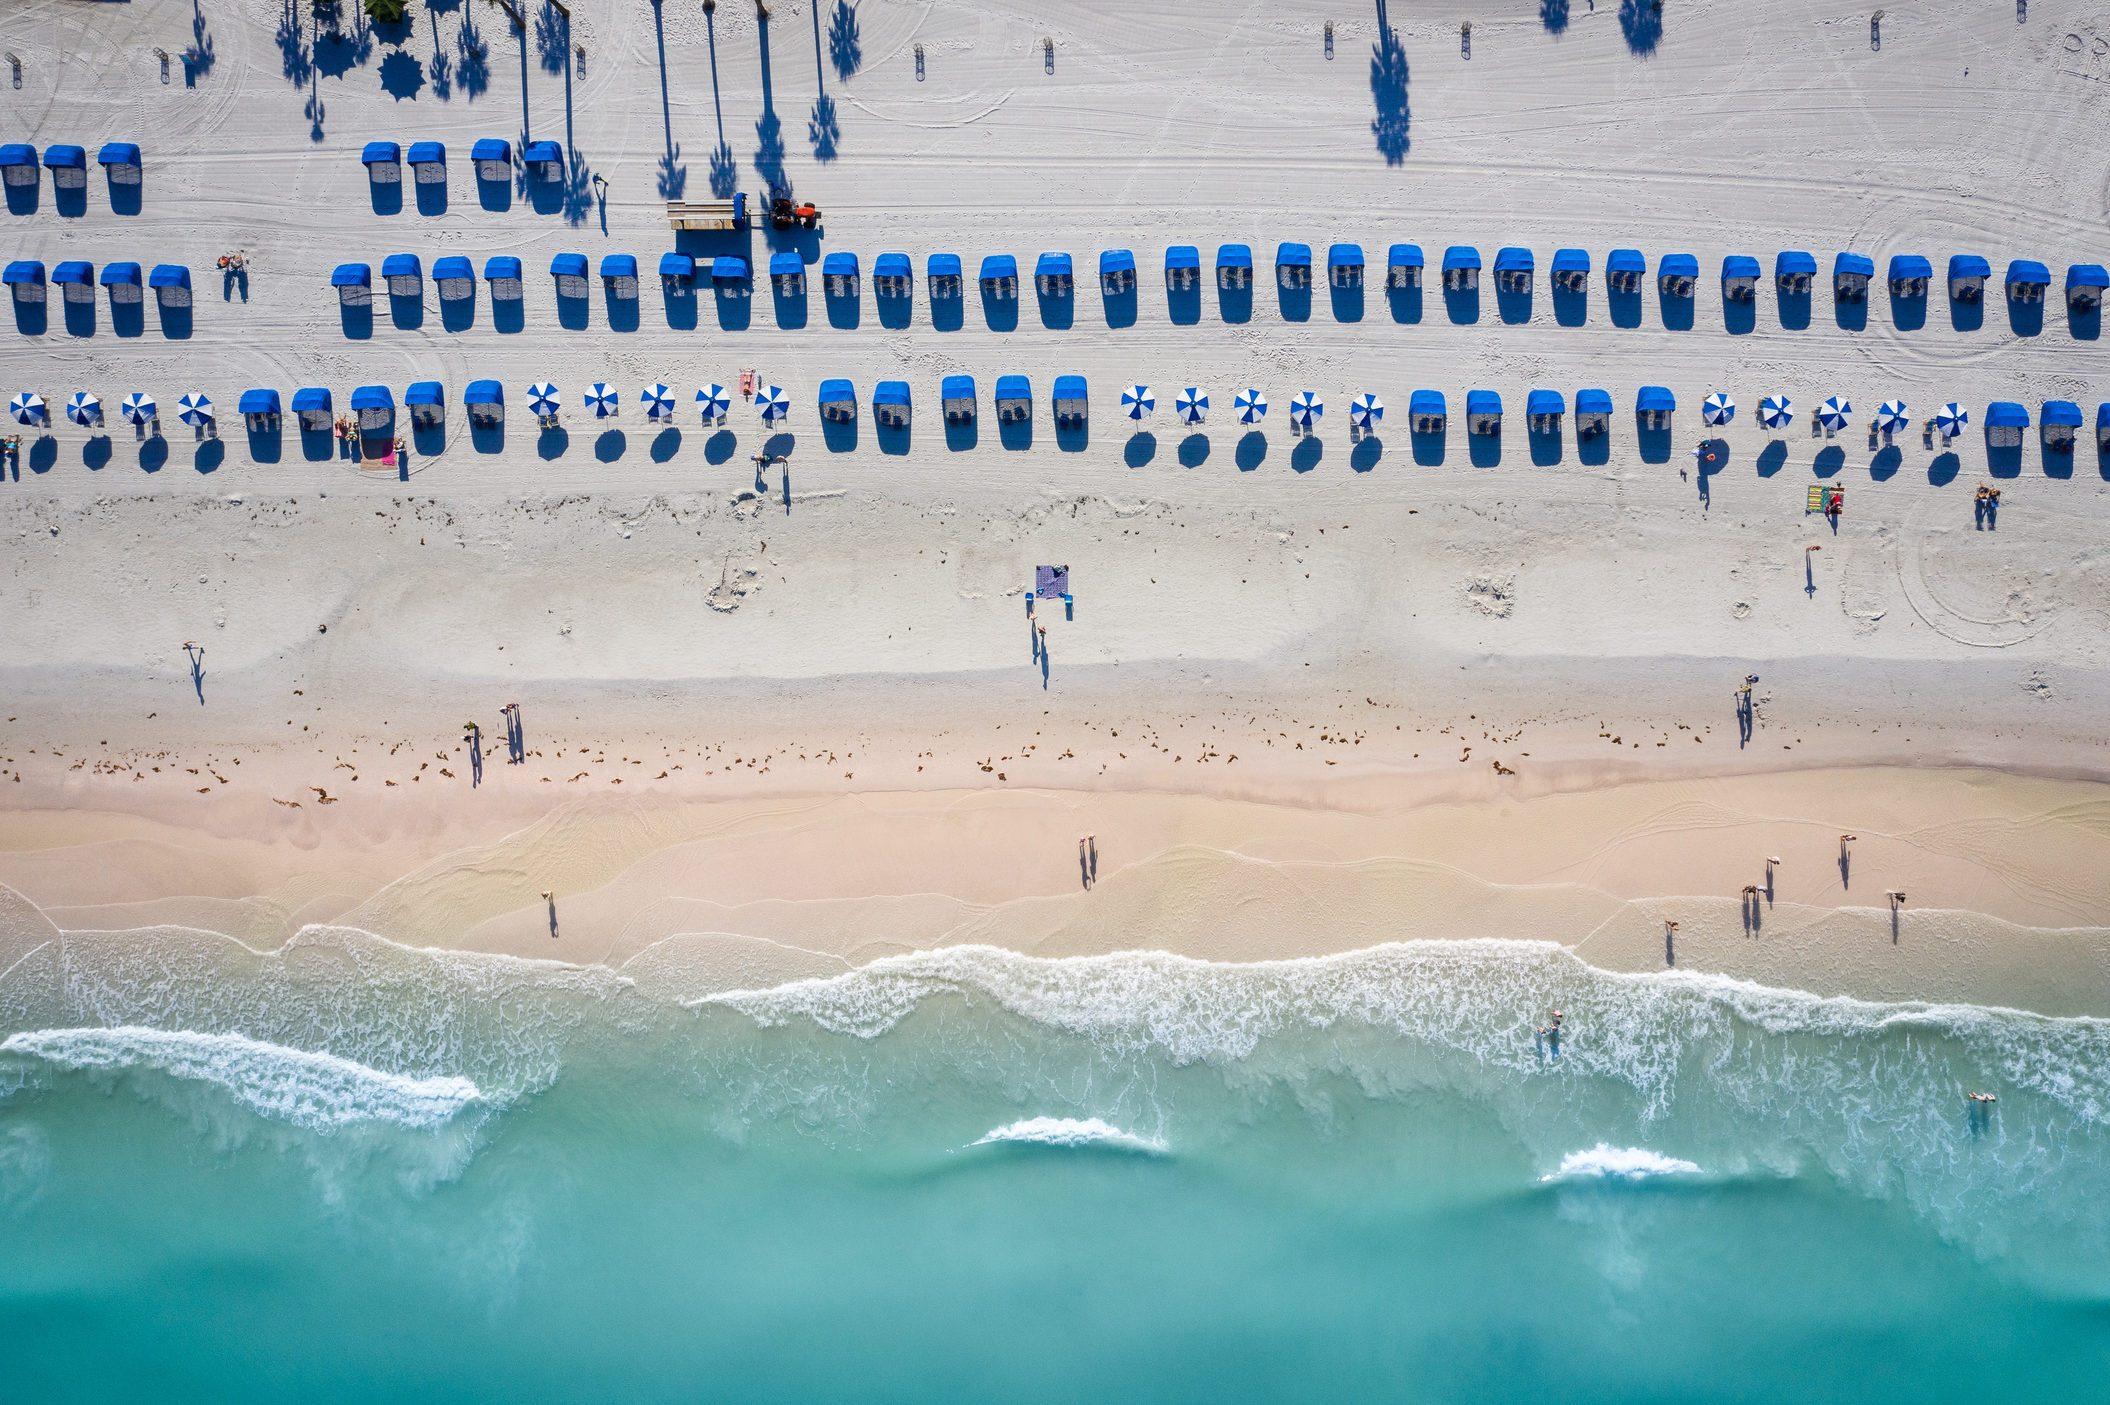 Aerial View Of Umbrellas On Beach